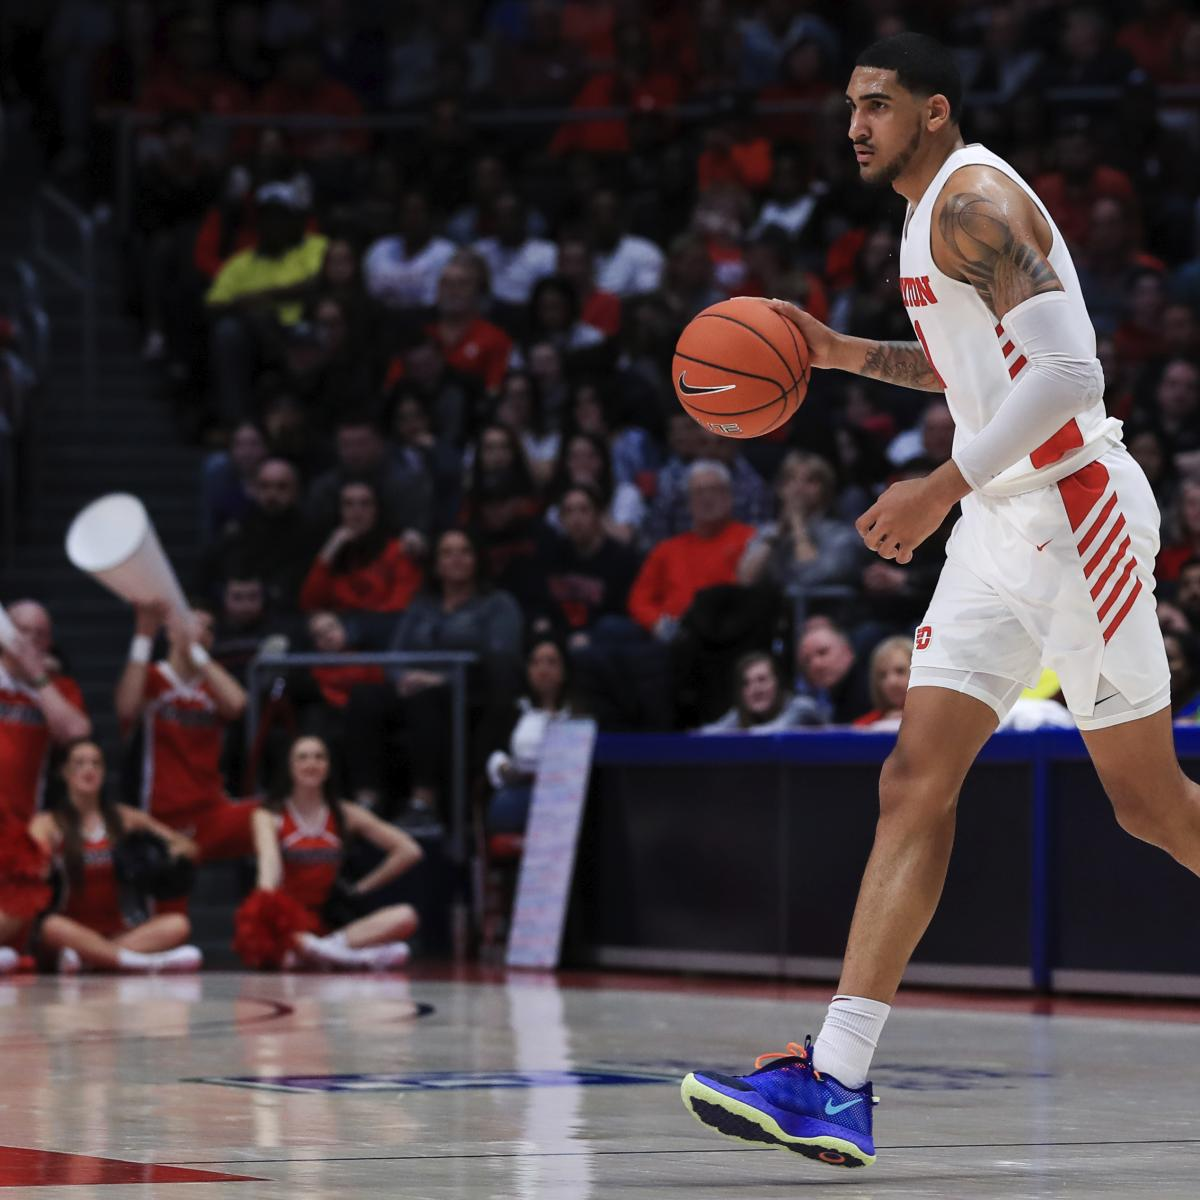 NBA Draft Results 2020: Easy-to-Read Grades, Picks for All 30 NBA Teams